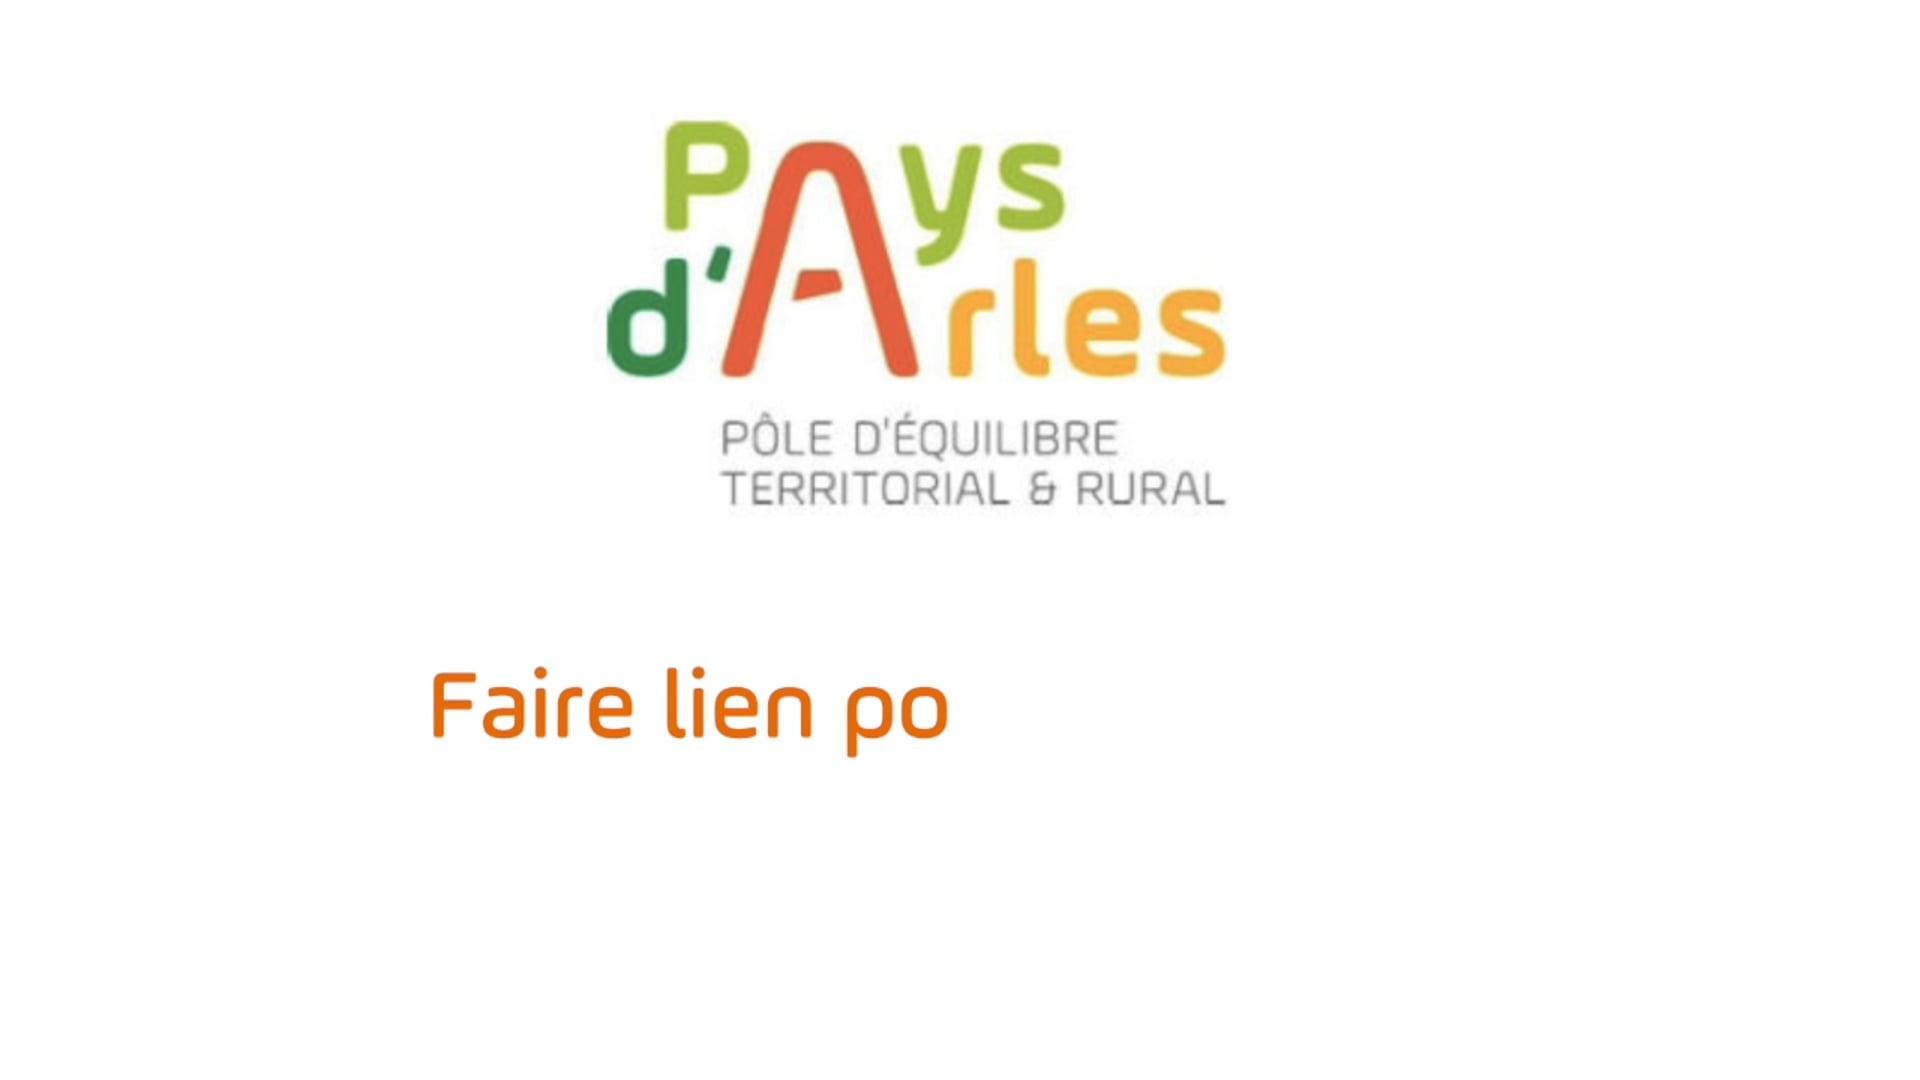 ECOLE LOUIS PERGAUD, RAPHELE-LES-ARLES